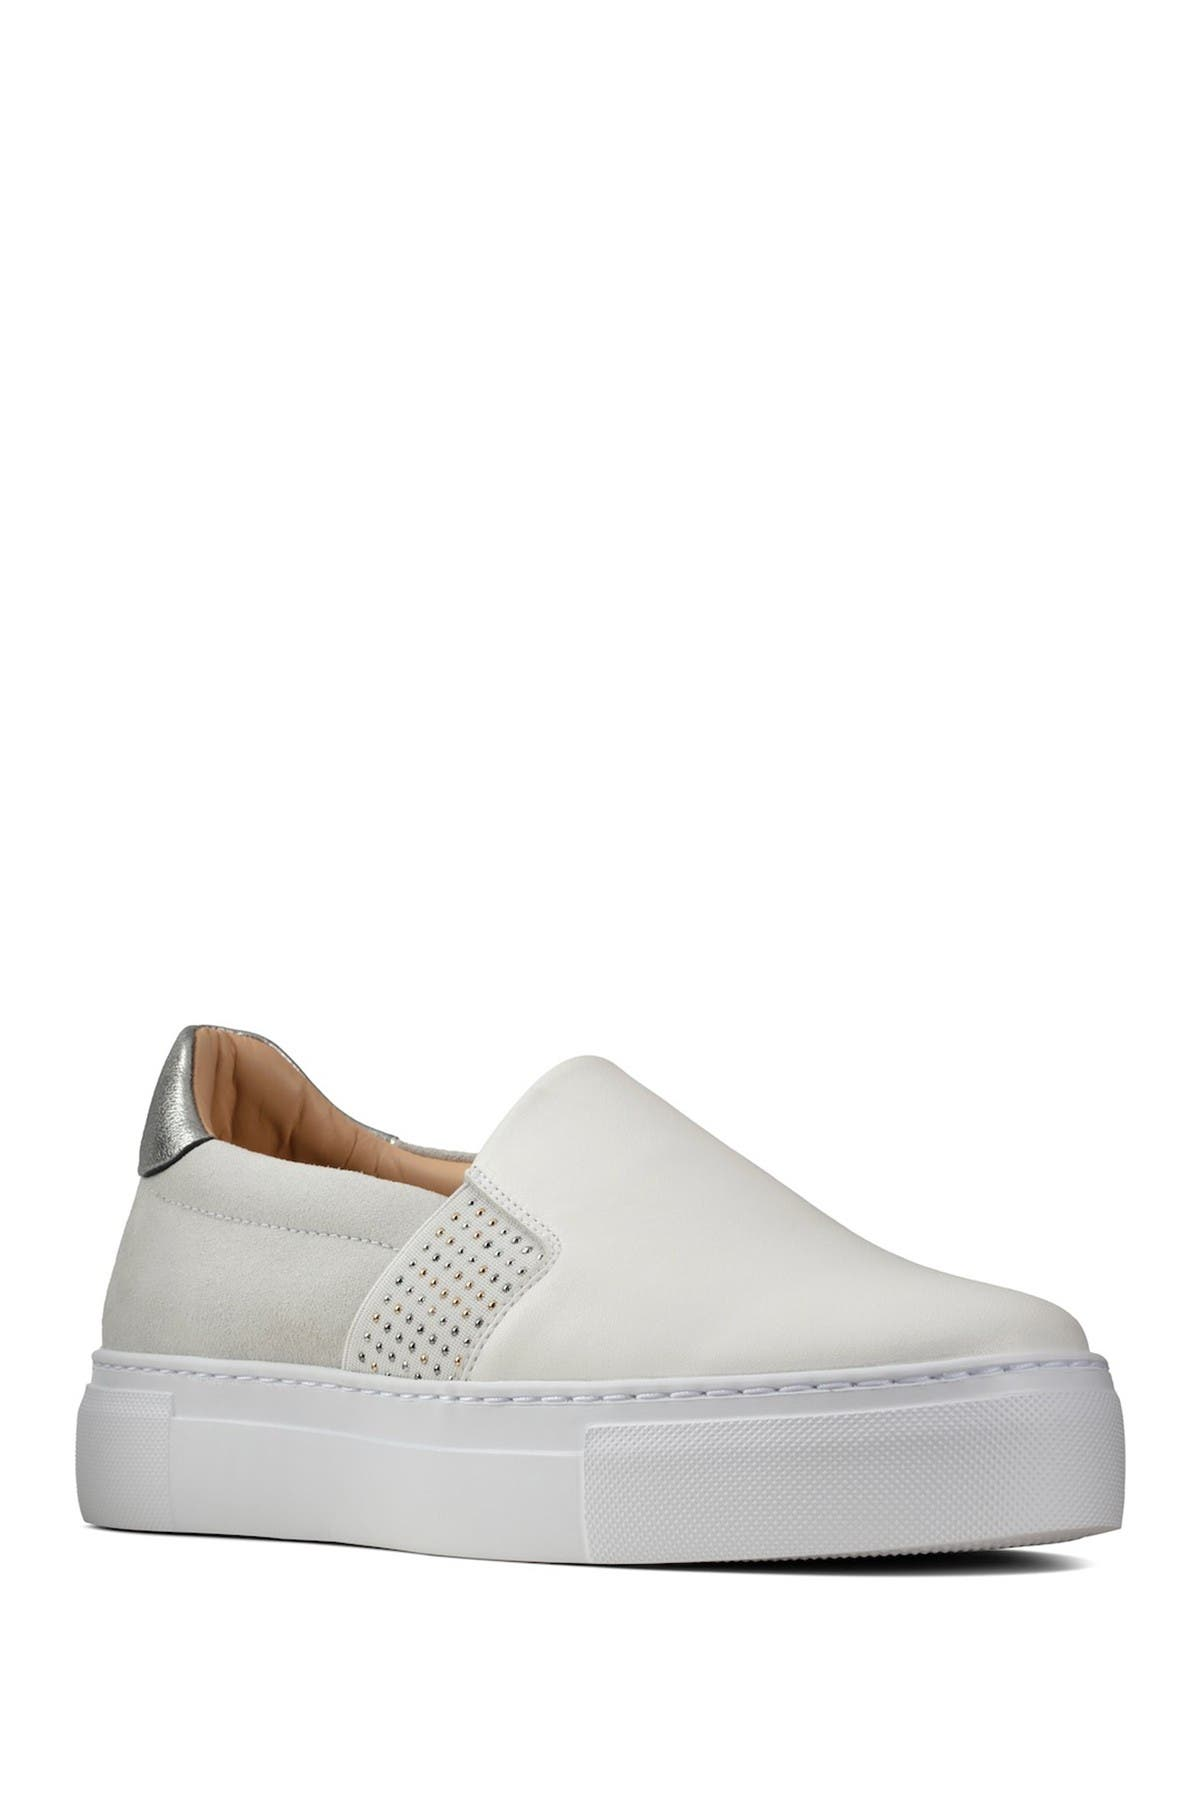 Image of Clarks Tansy Step Slip-On Sneaker